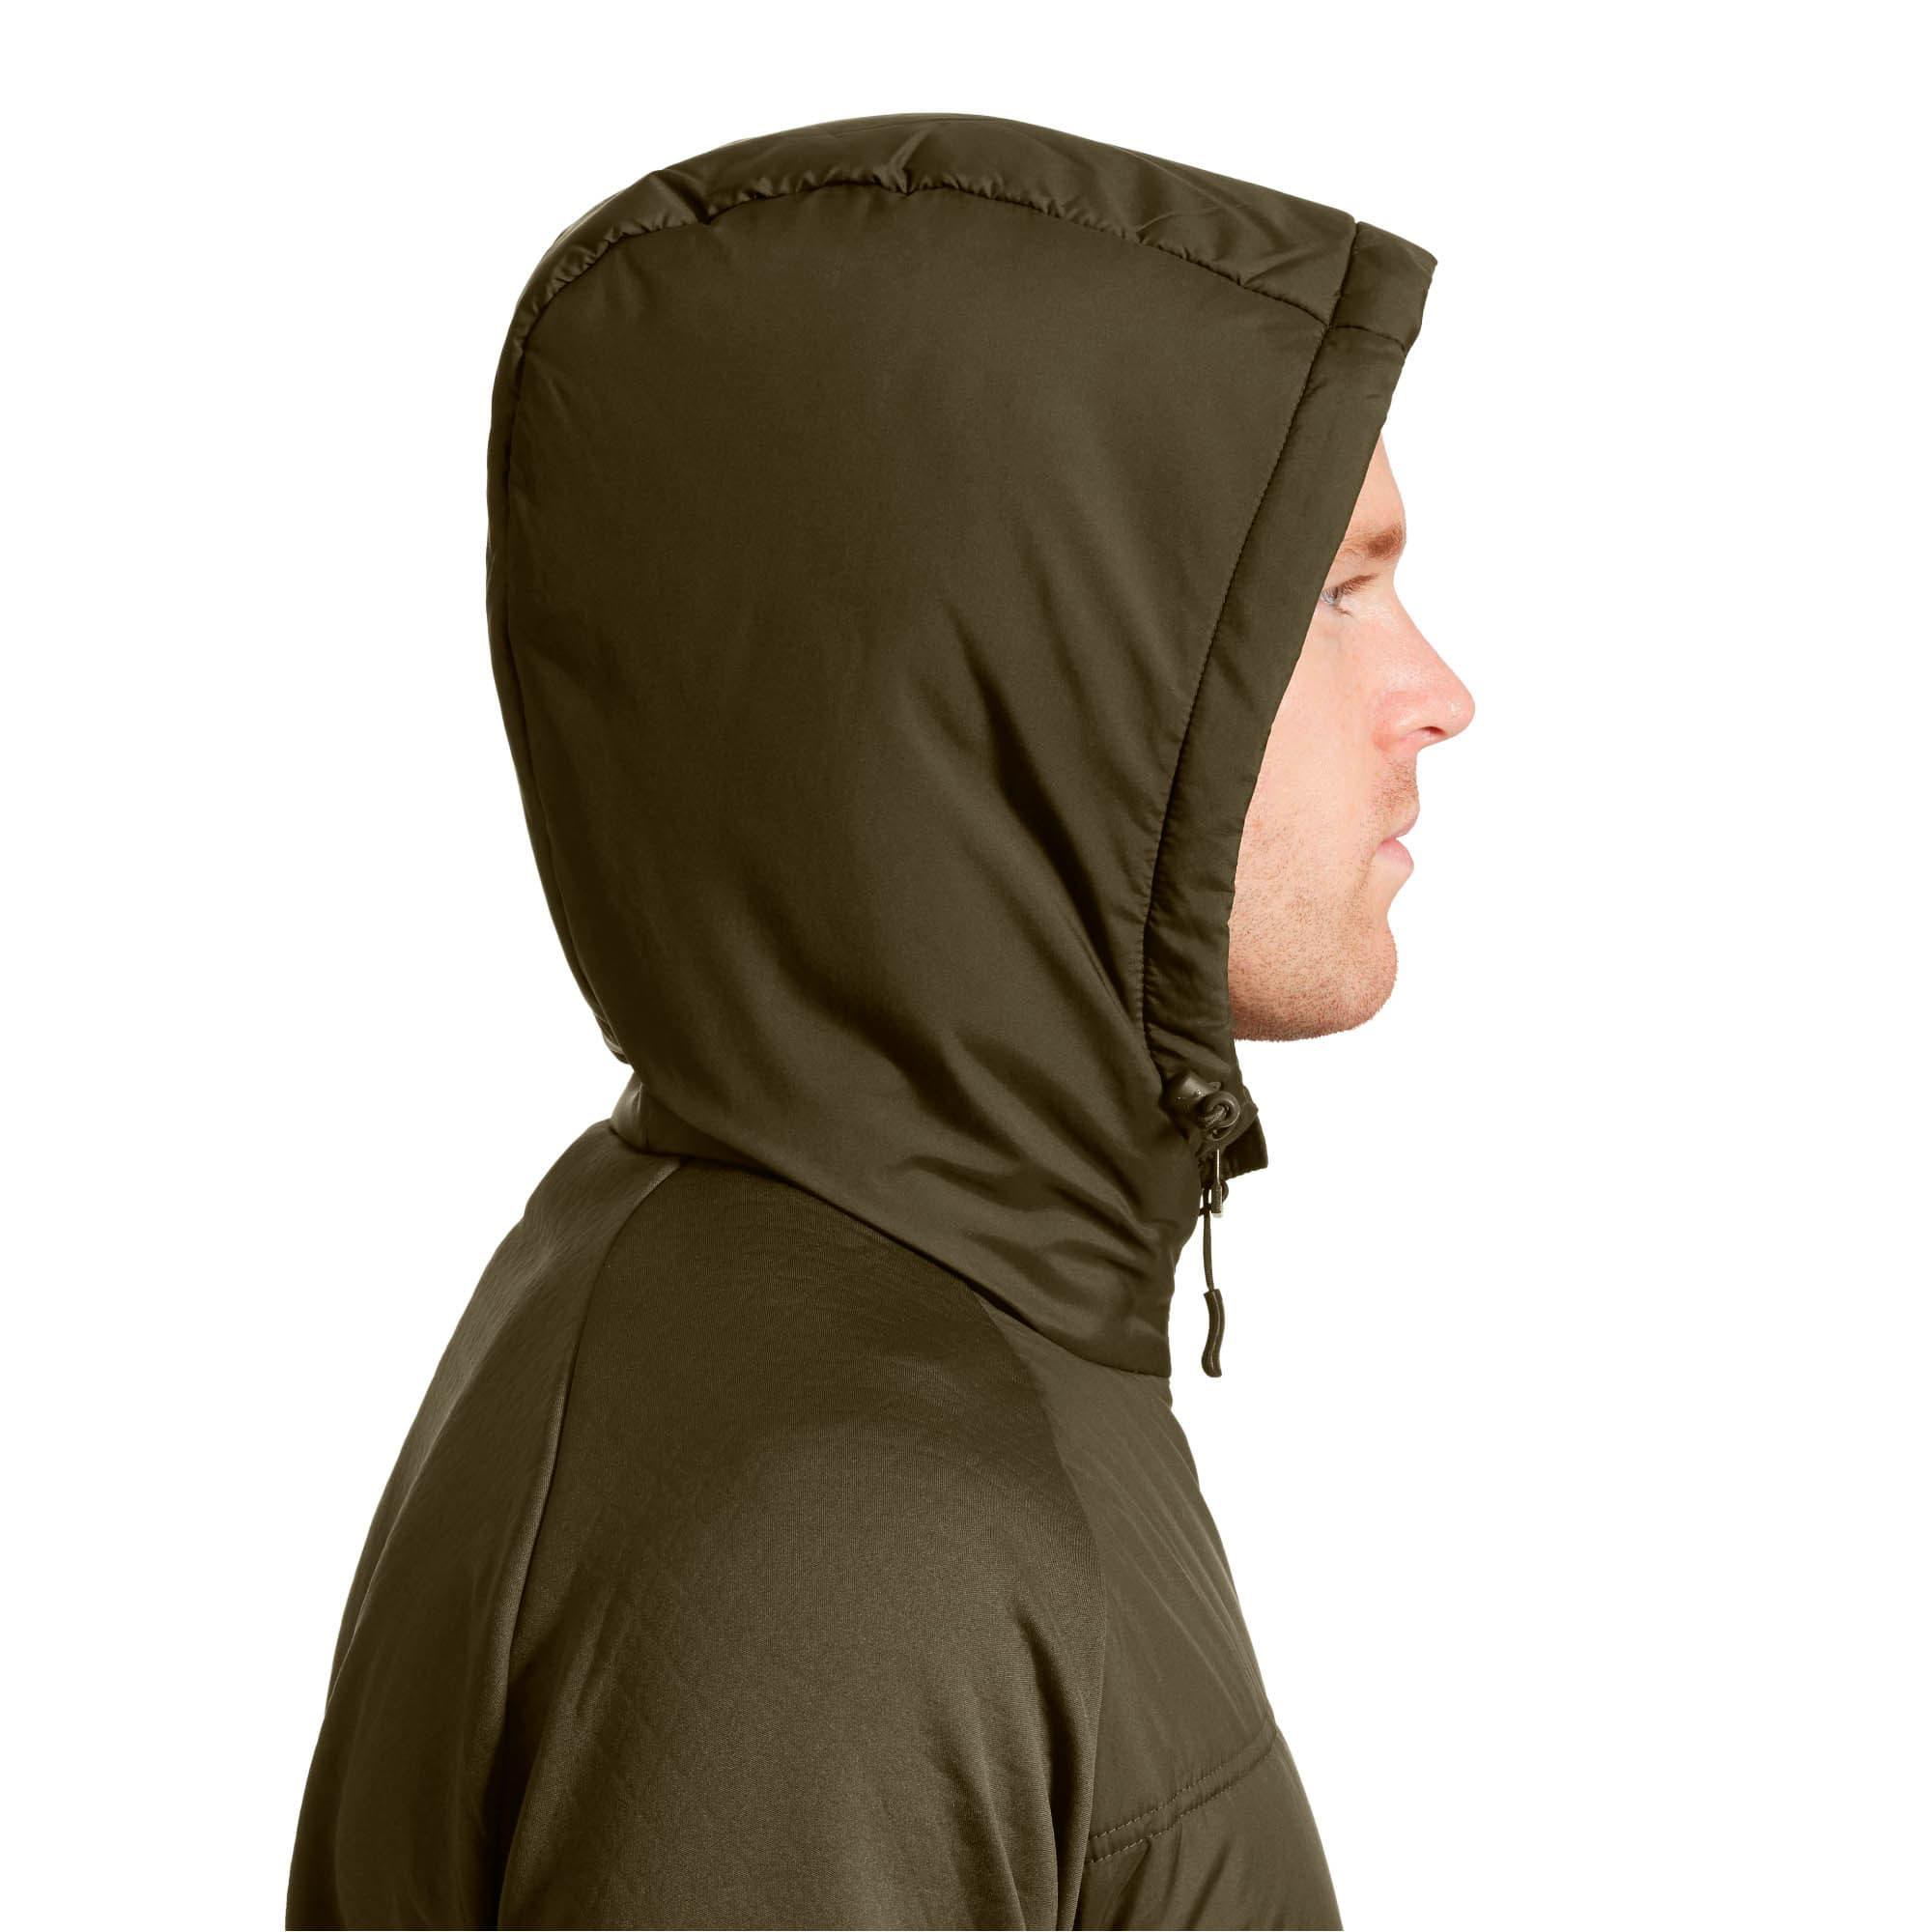 Thumbnail 4 of Hybrid Men's Padded Jacket, Forest Night, medium